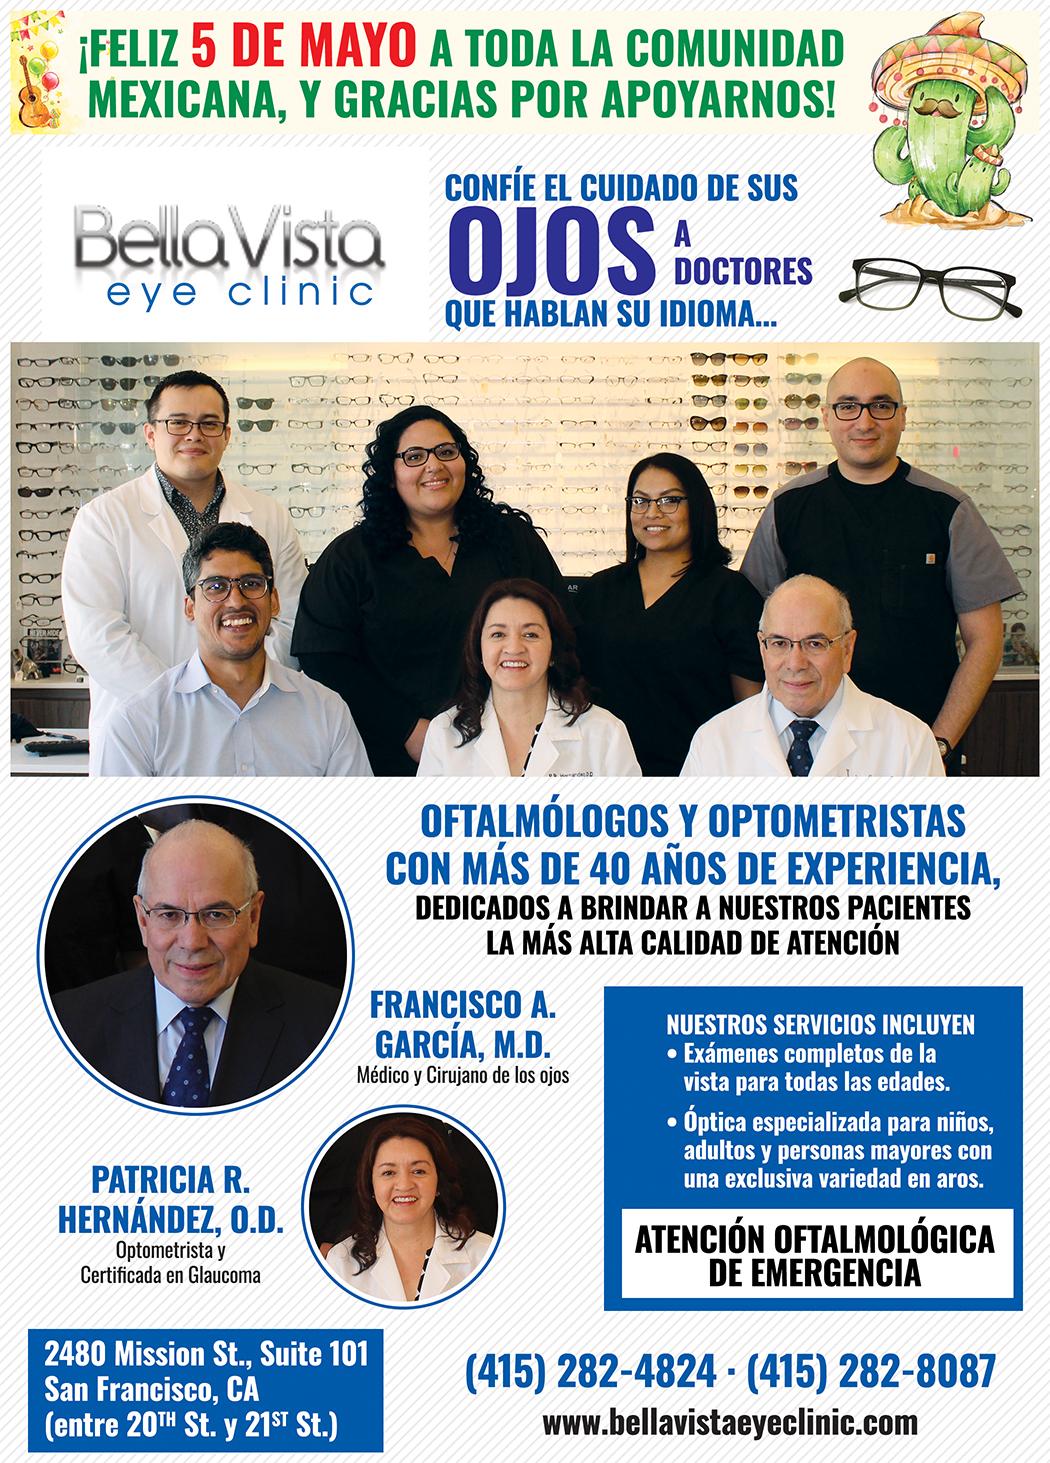 Bella Vista Eye 1 PAG MAYO 2019 - 2 copy.jpg